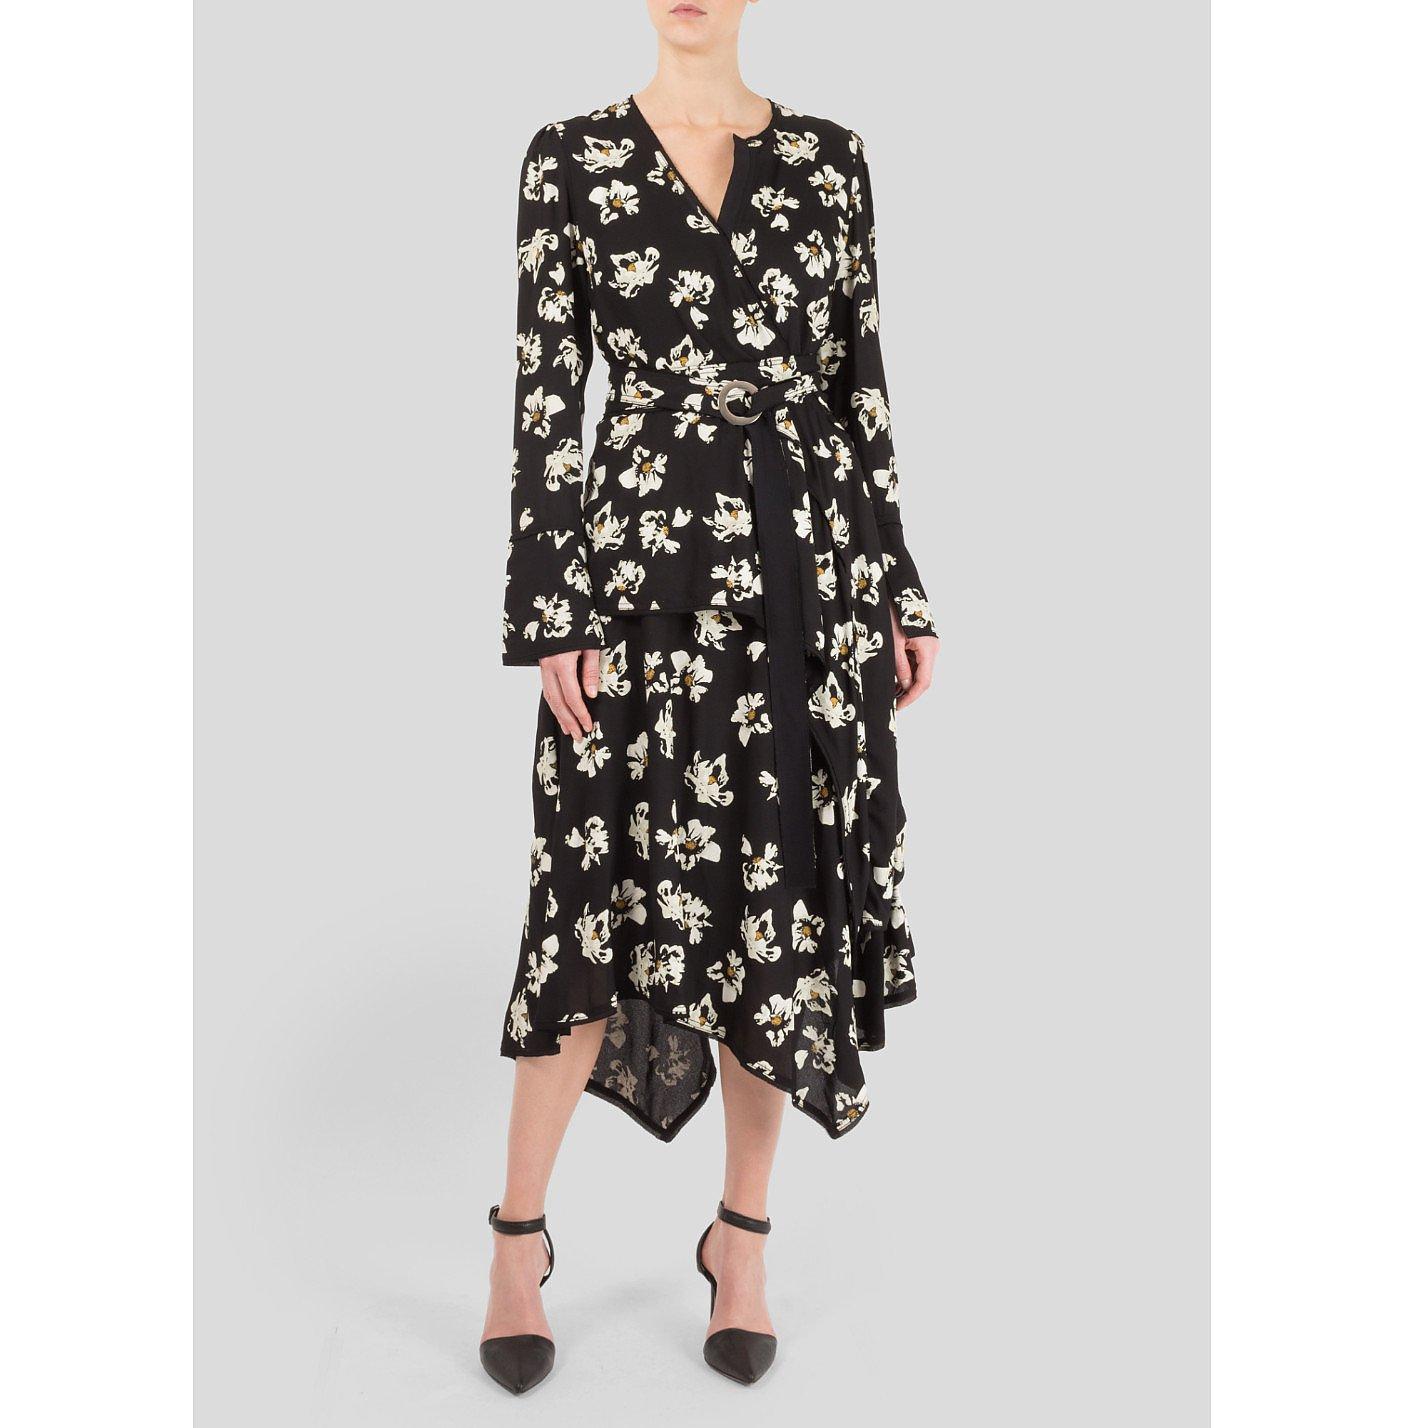 Proenza Schouler Wrap-Effect Printed Crepe Midi Dress